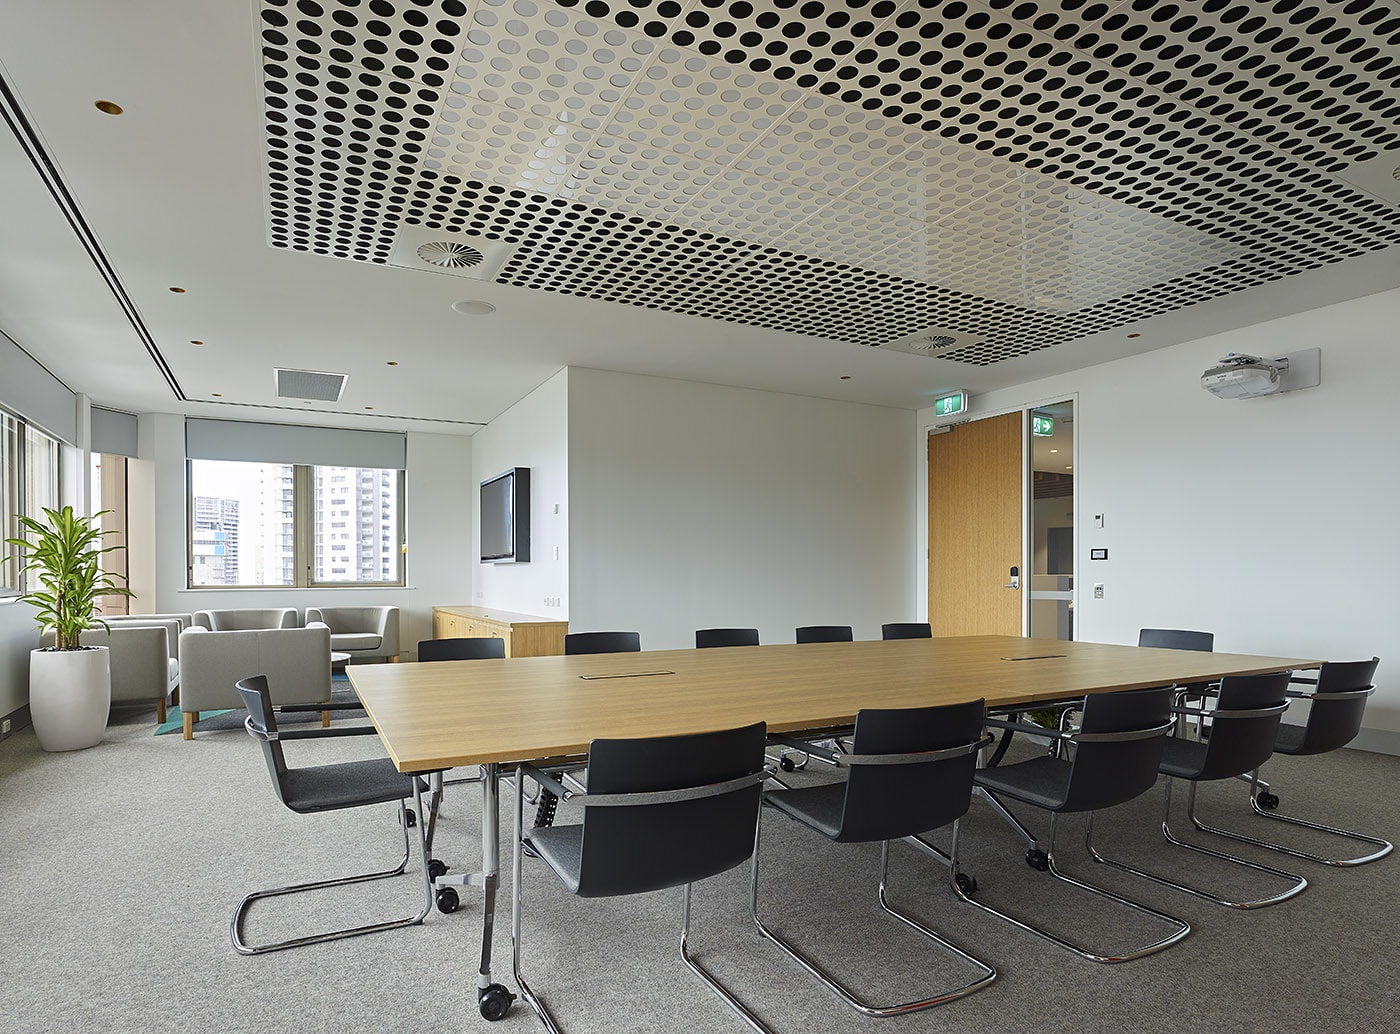 Ausure Brisbane Tenant Representation, Interior Design, Project & Construction Management Project Image 5 by PCG